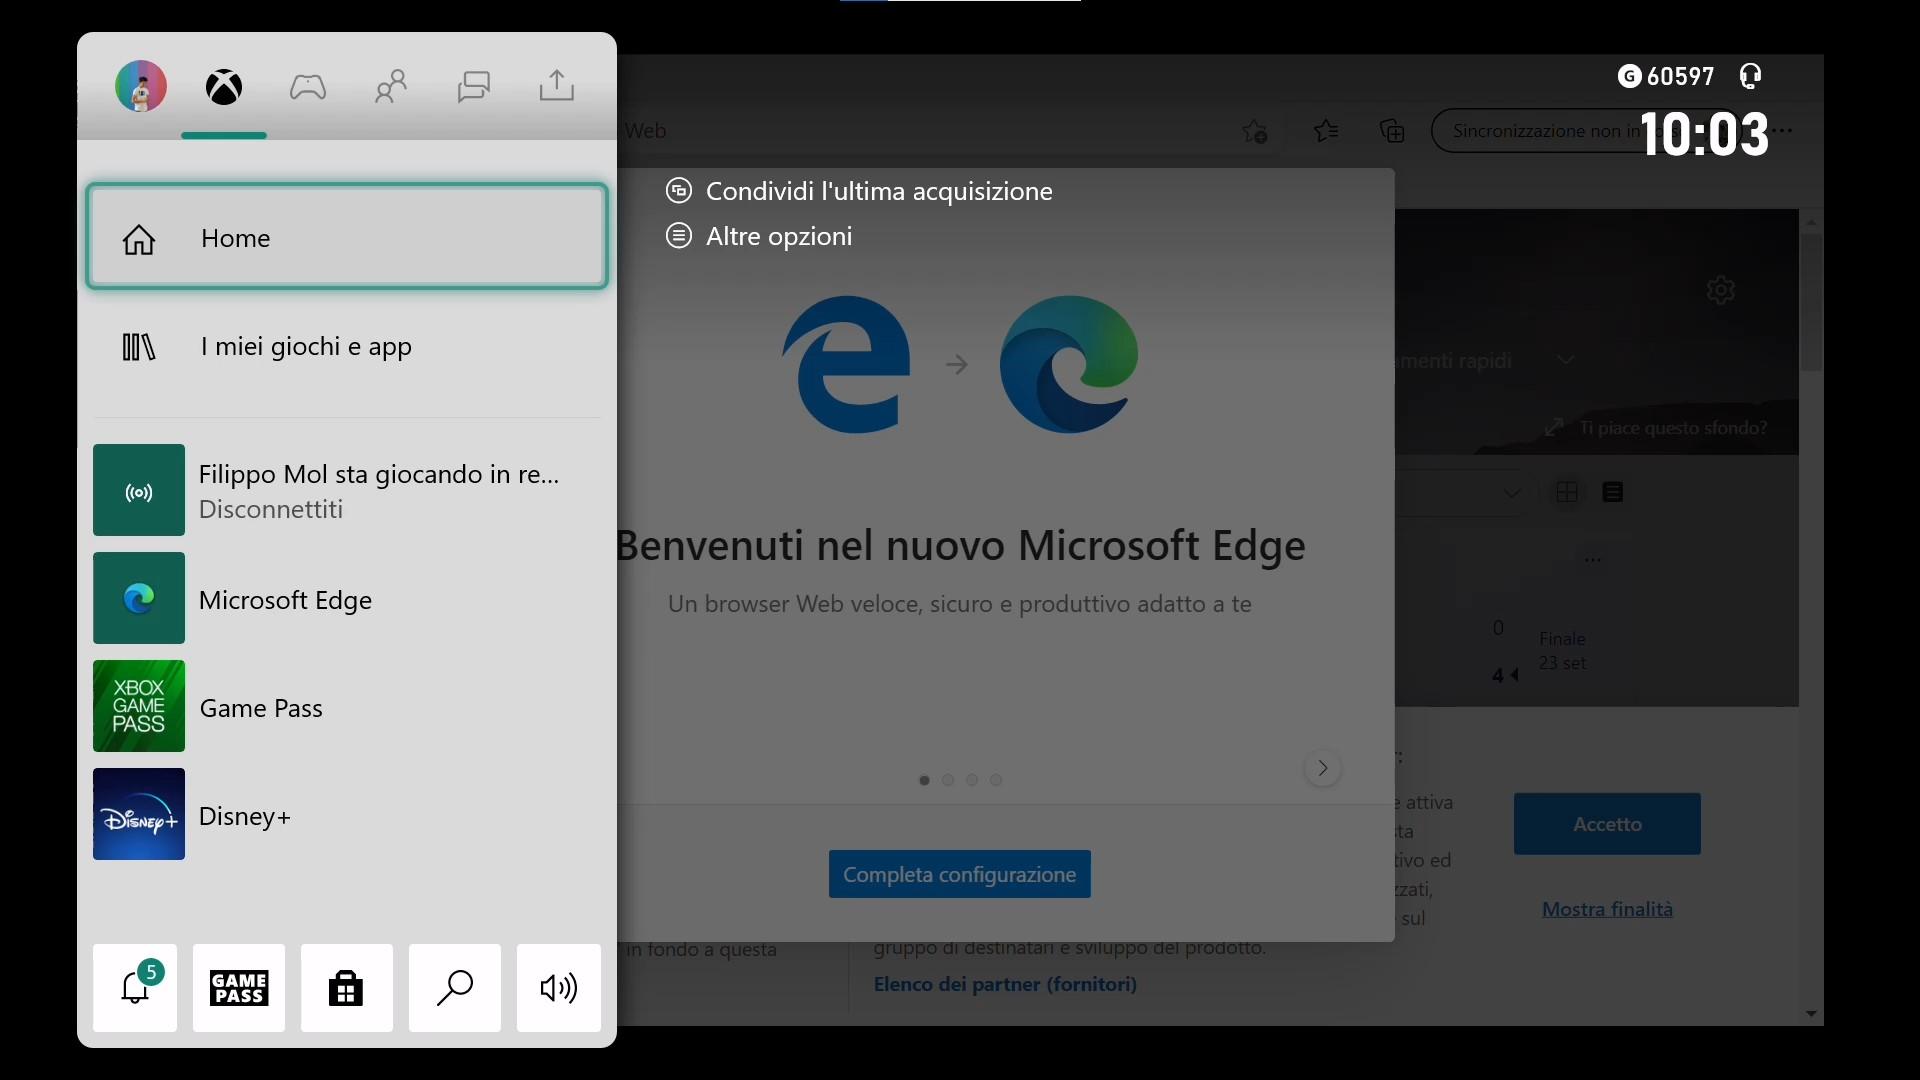 Xbox - Nuovo Microsoft Edge basato su Chromium